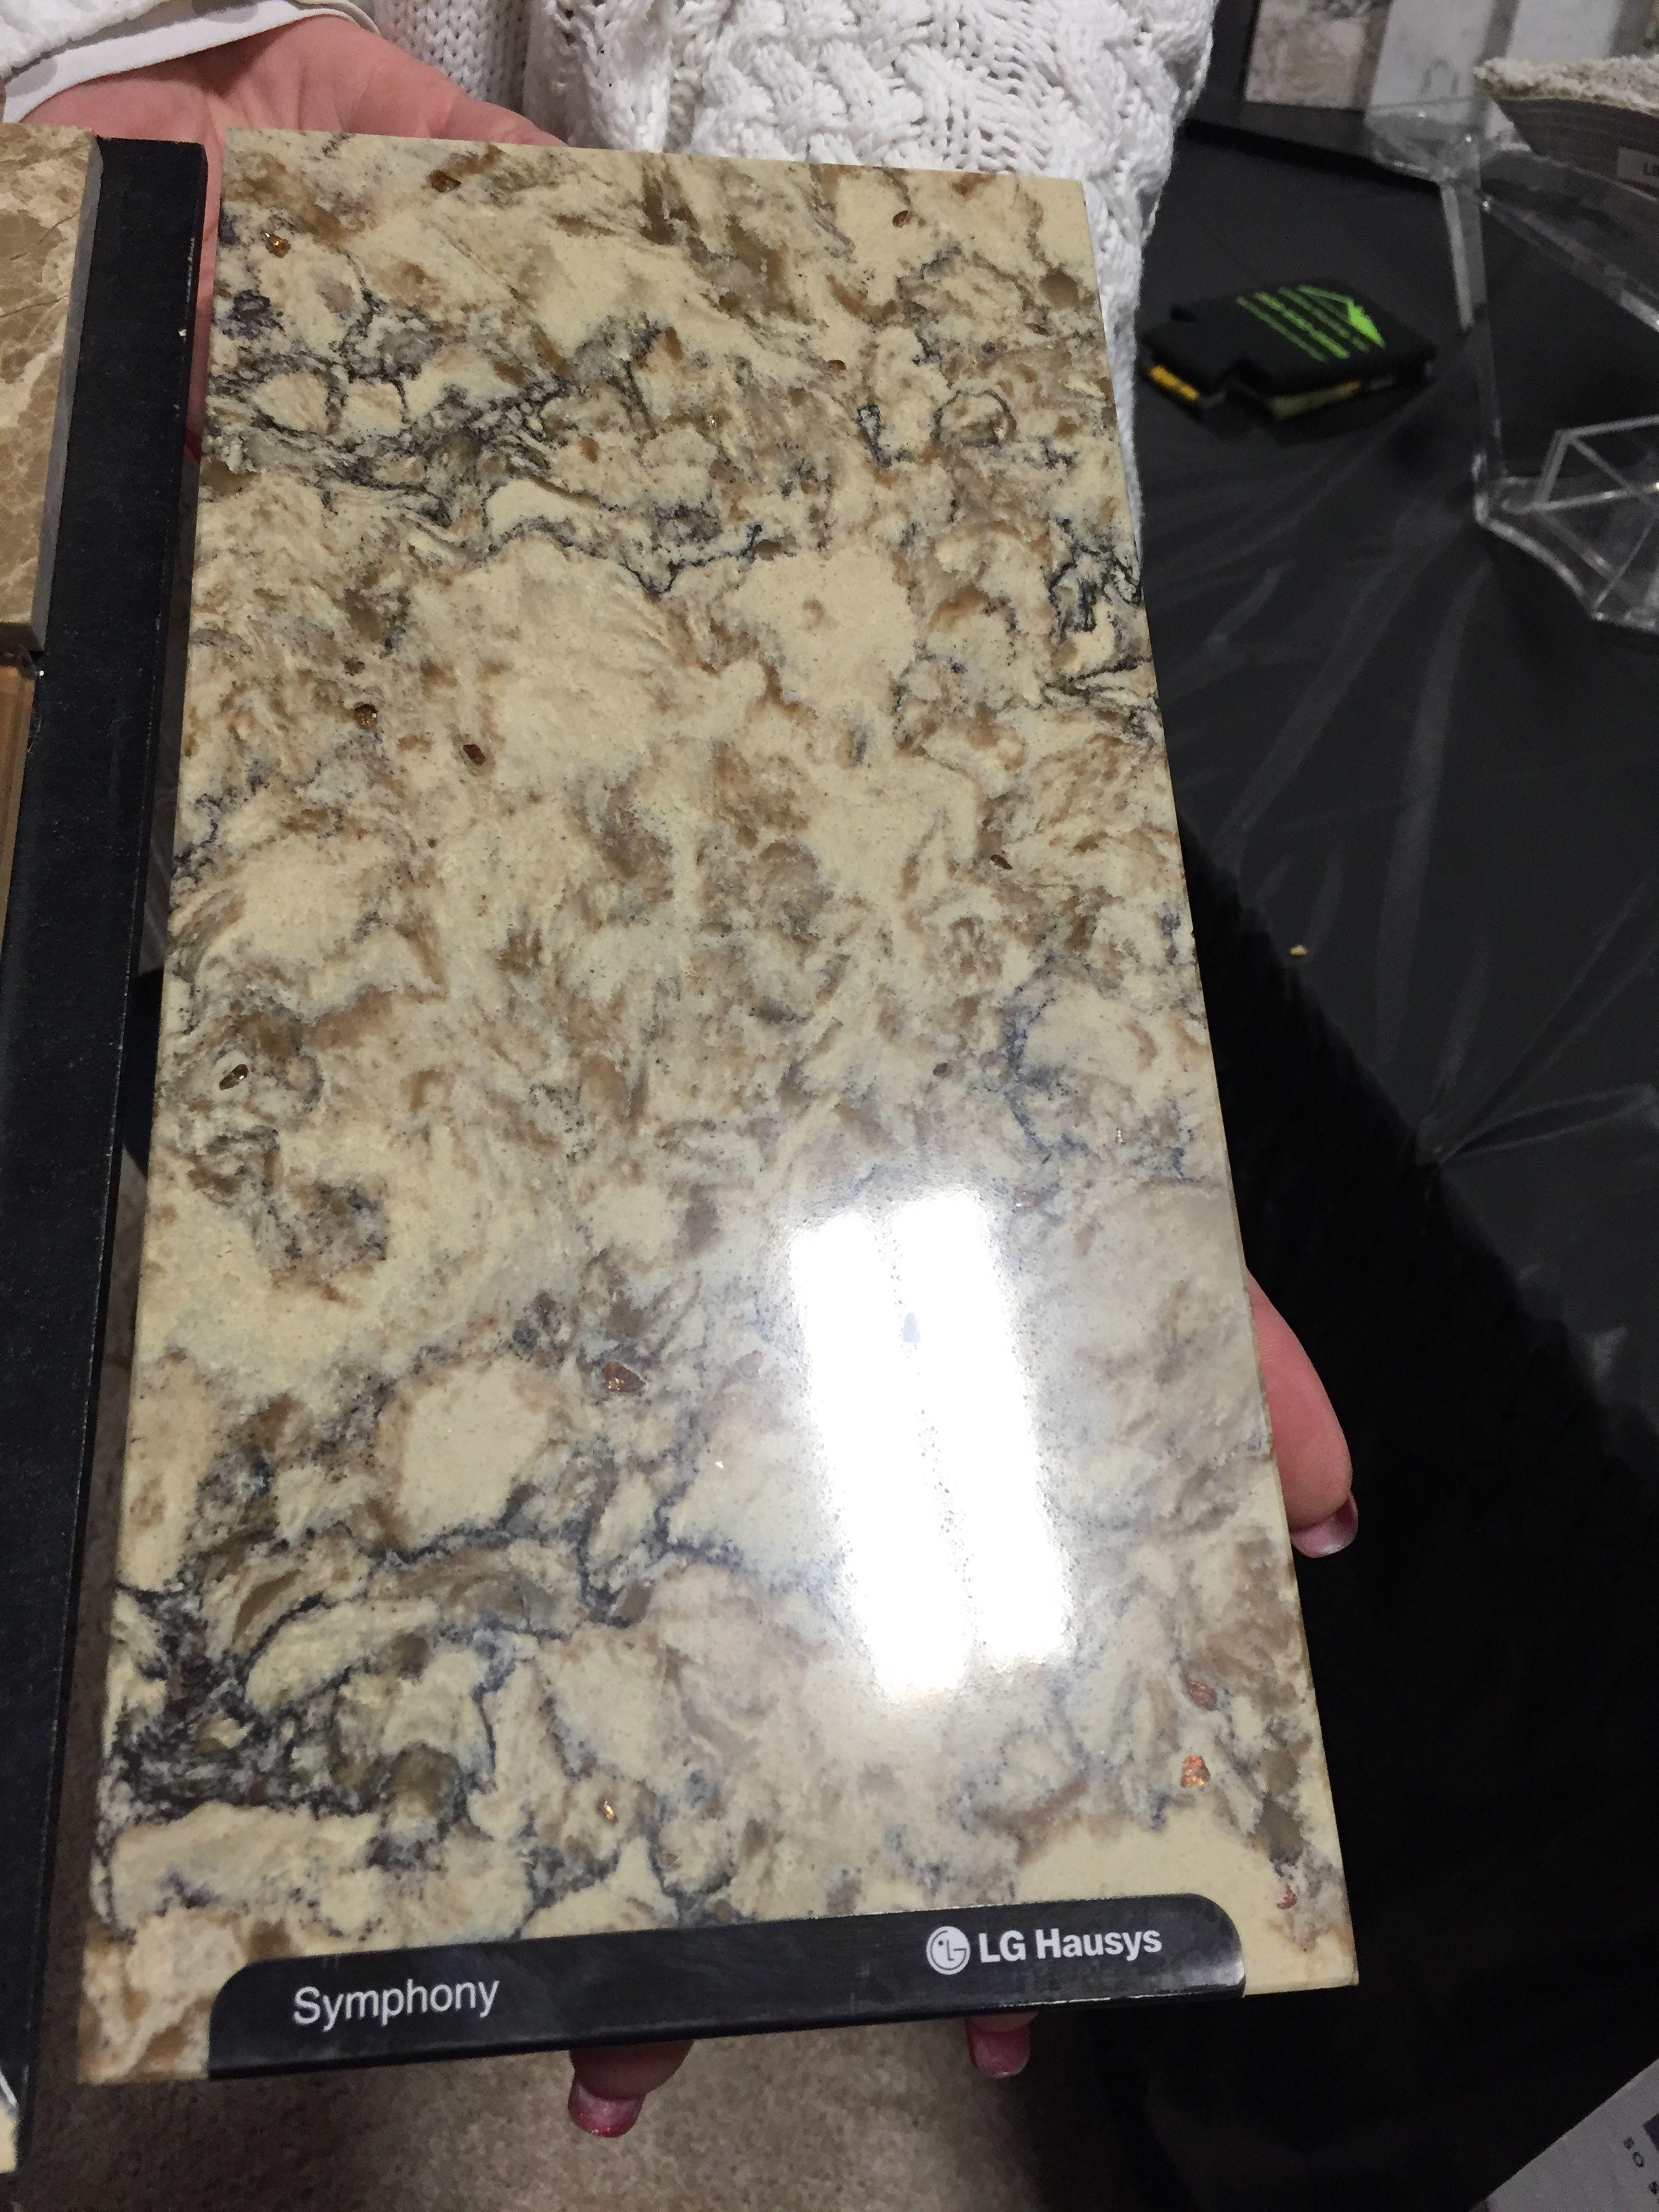 Quartz Versus Granite Kitchen Countertops Quartz Countertop Symphony Lg Hausys Saw At Colortile Booth At